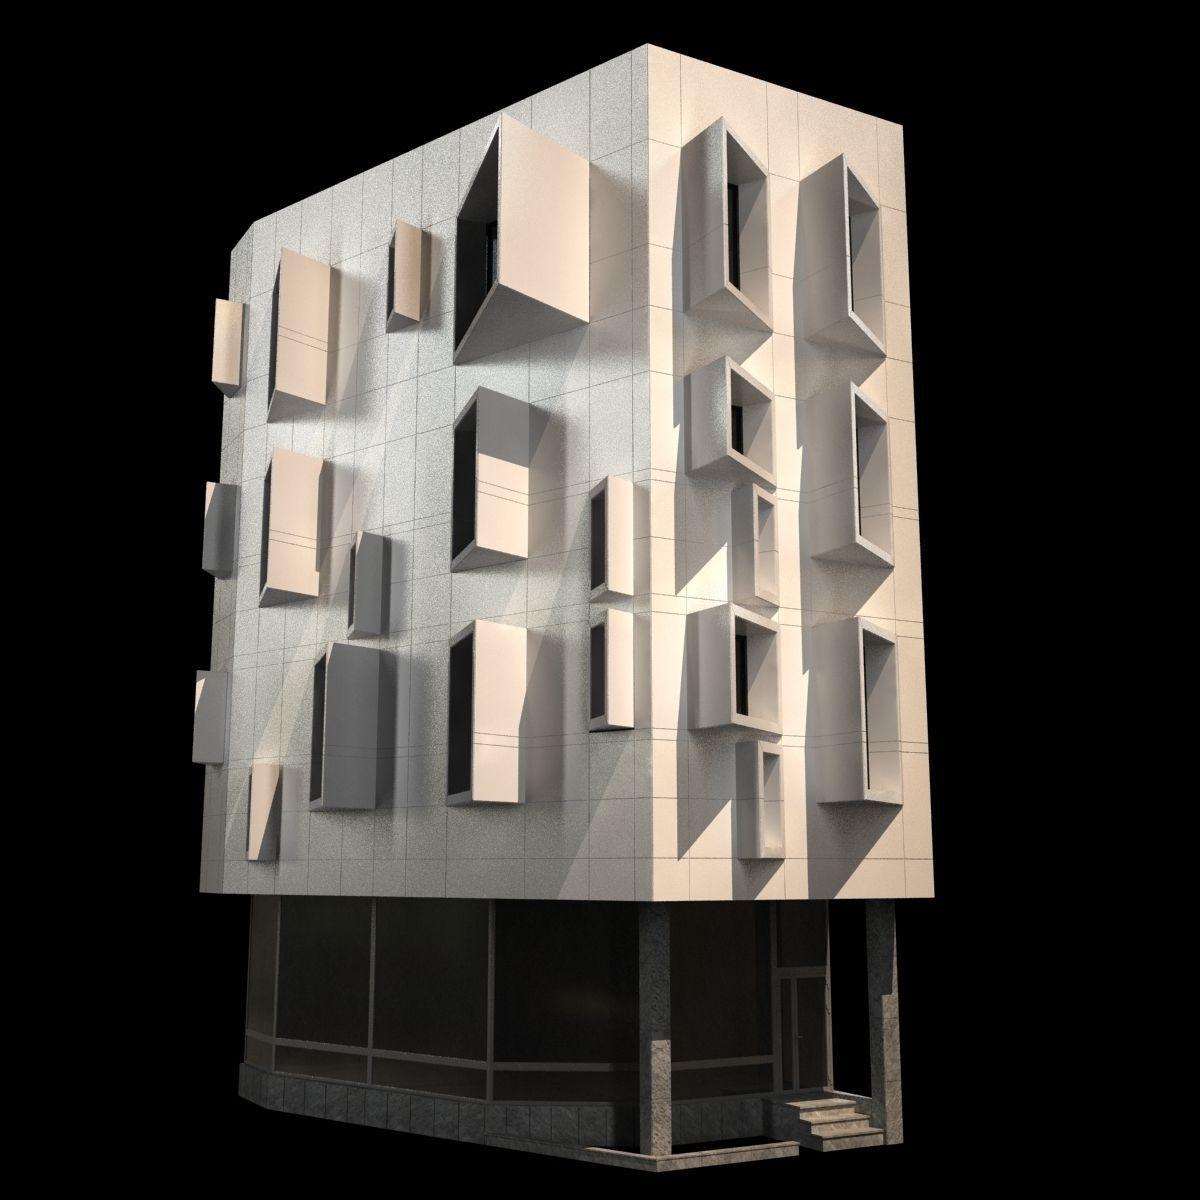 Modern corner building 3d model max obj 3ds fbx mtl for 3d max building